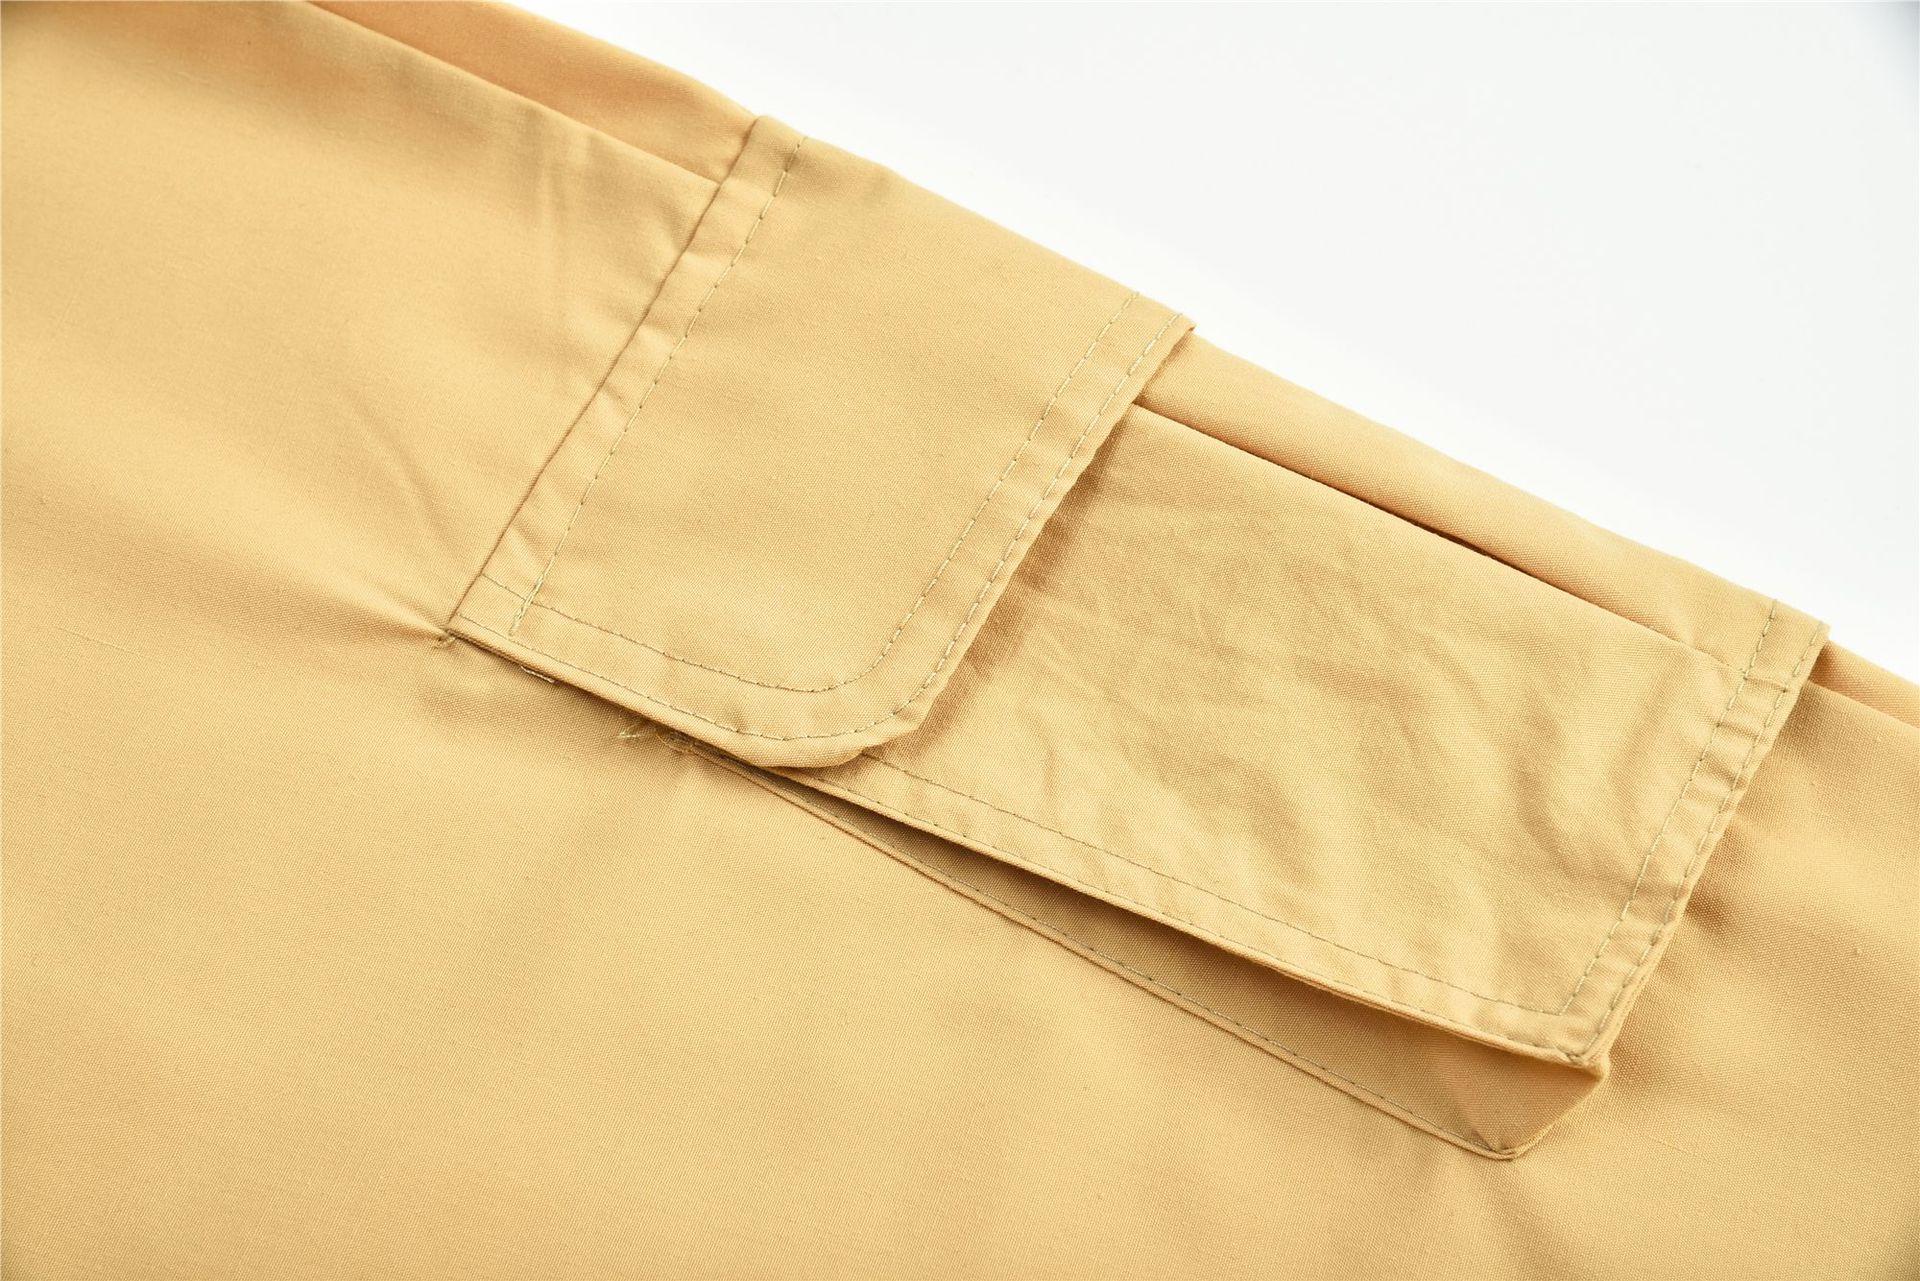 Pockets Cargo Pants Women High Waist Loose Streetwear Pants Harajuku Tactical Trouser Hip Hop Joggers Pants Woman Cloth